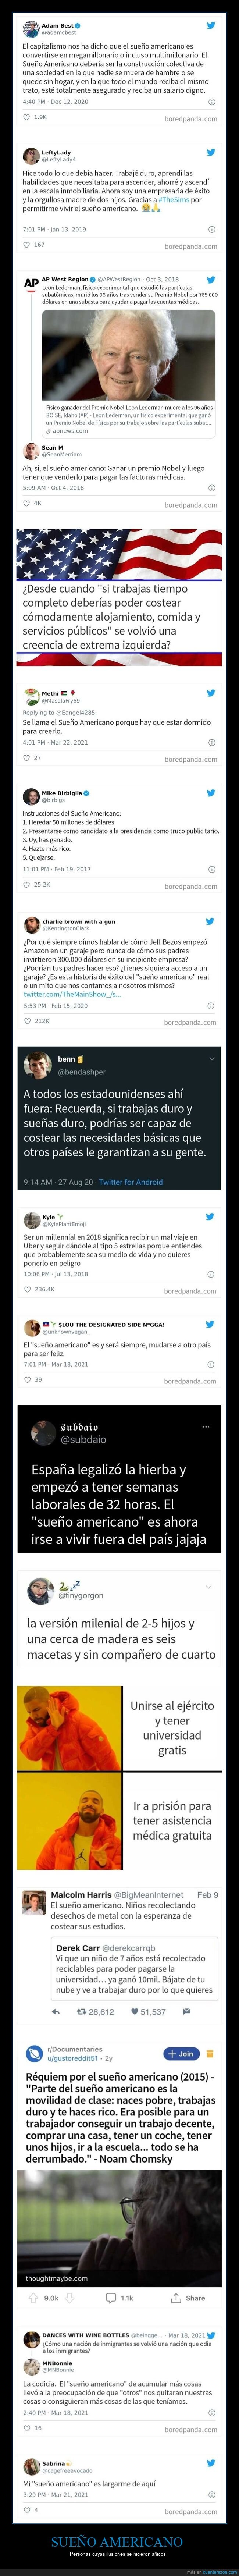 eeuu,sueño americano